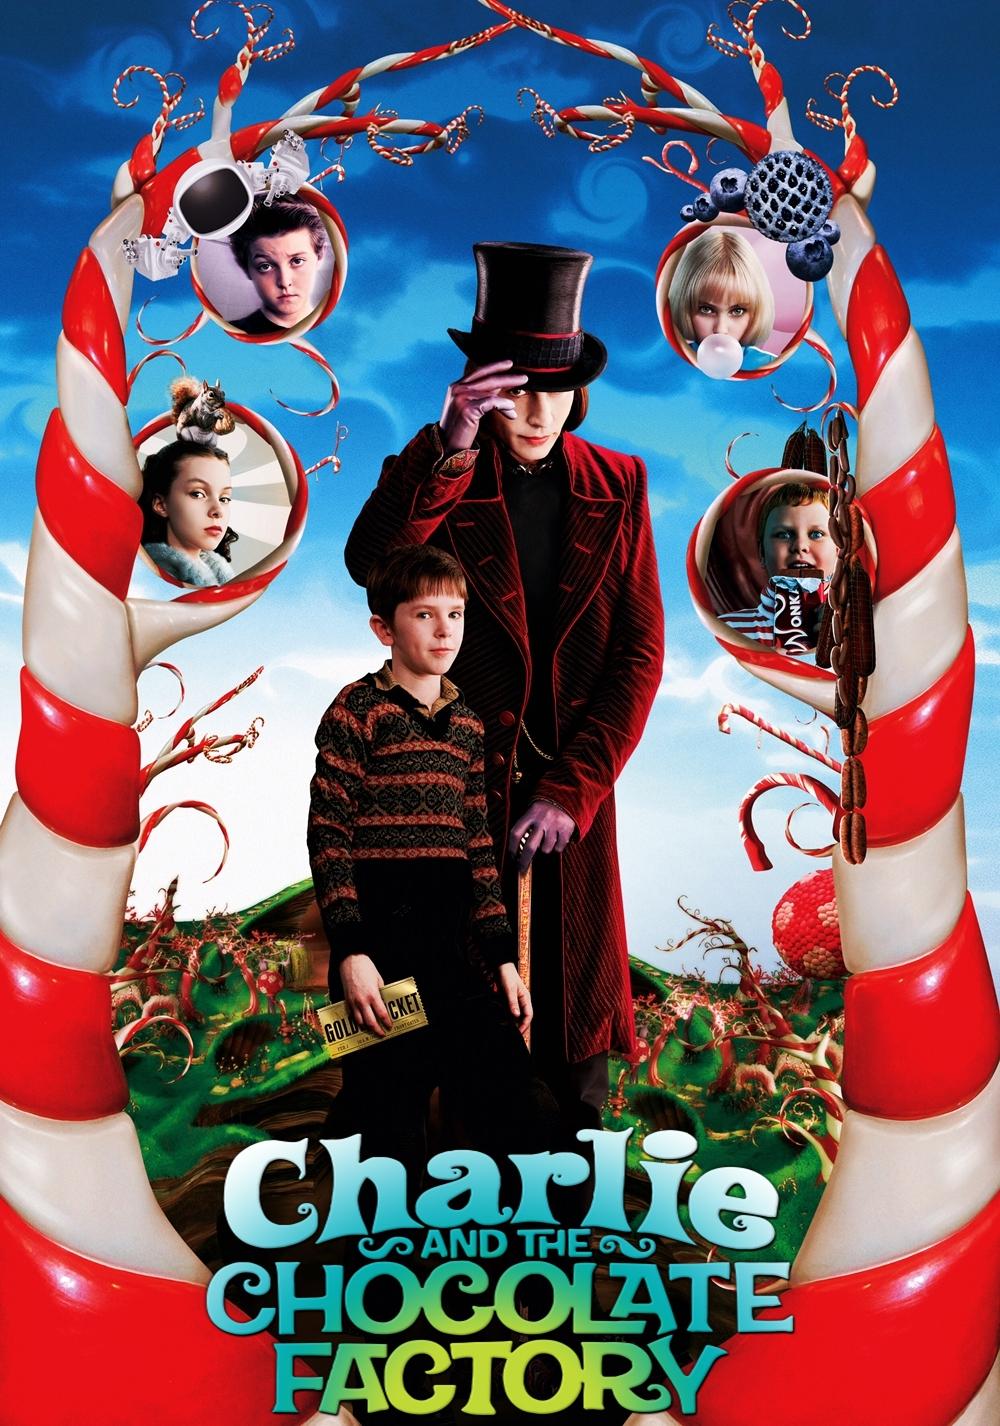 charlie-and-the-chocolate-factory-53273584b6e29.jpeg